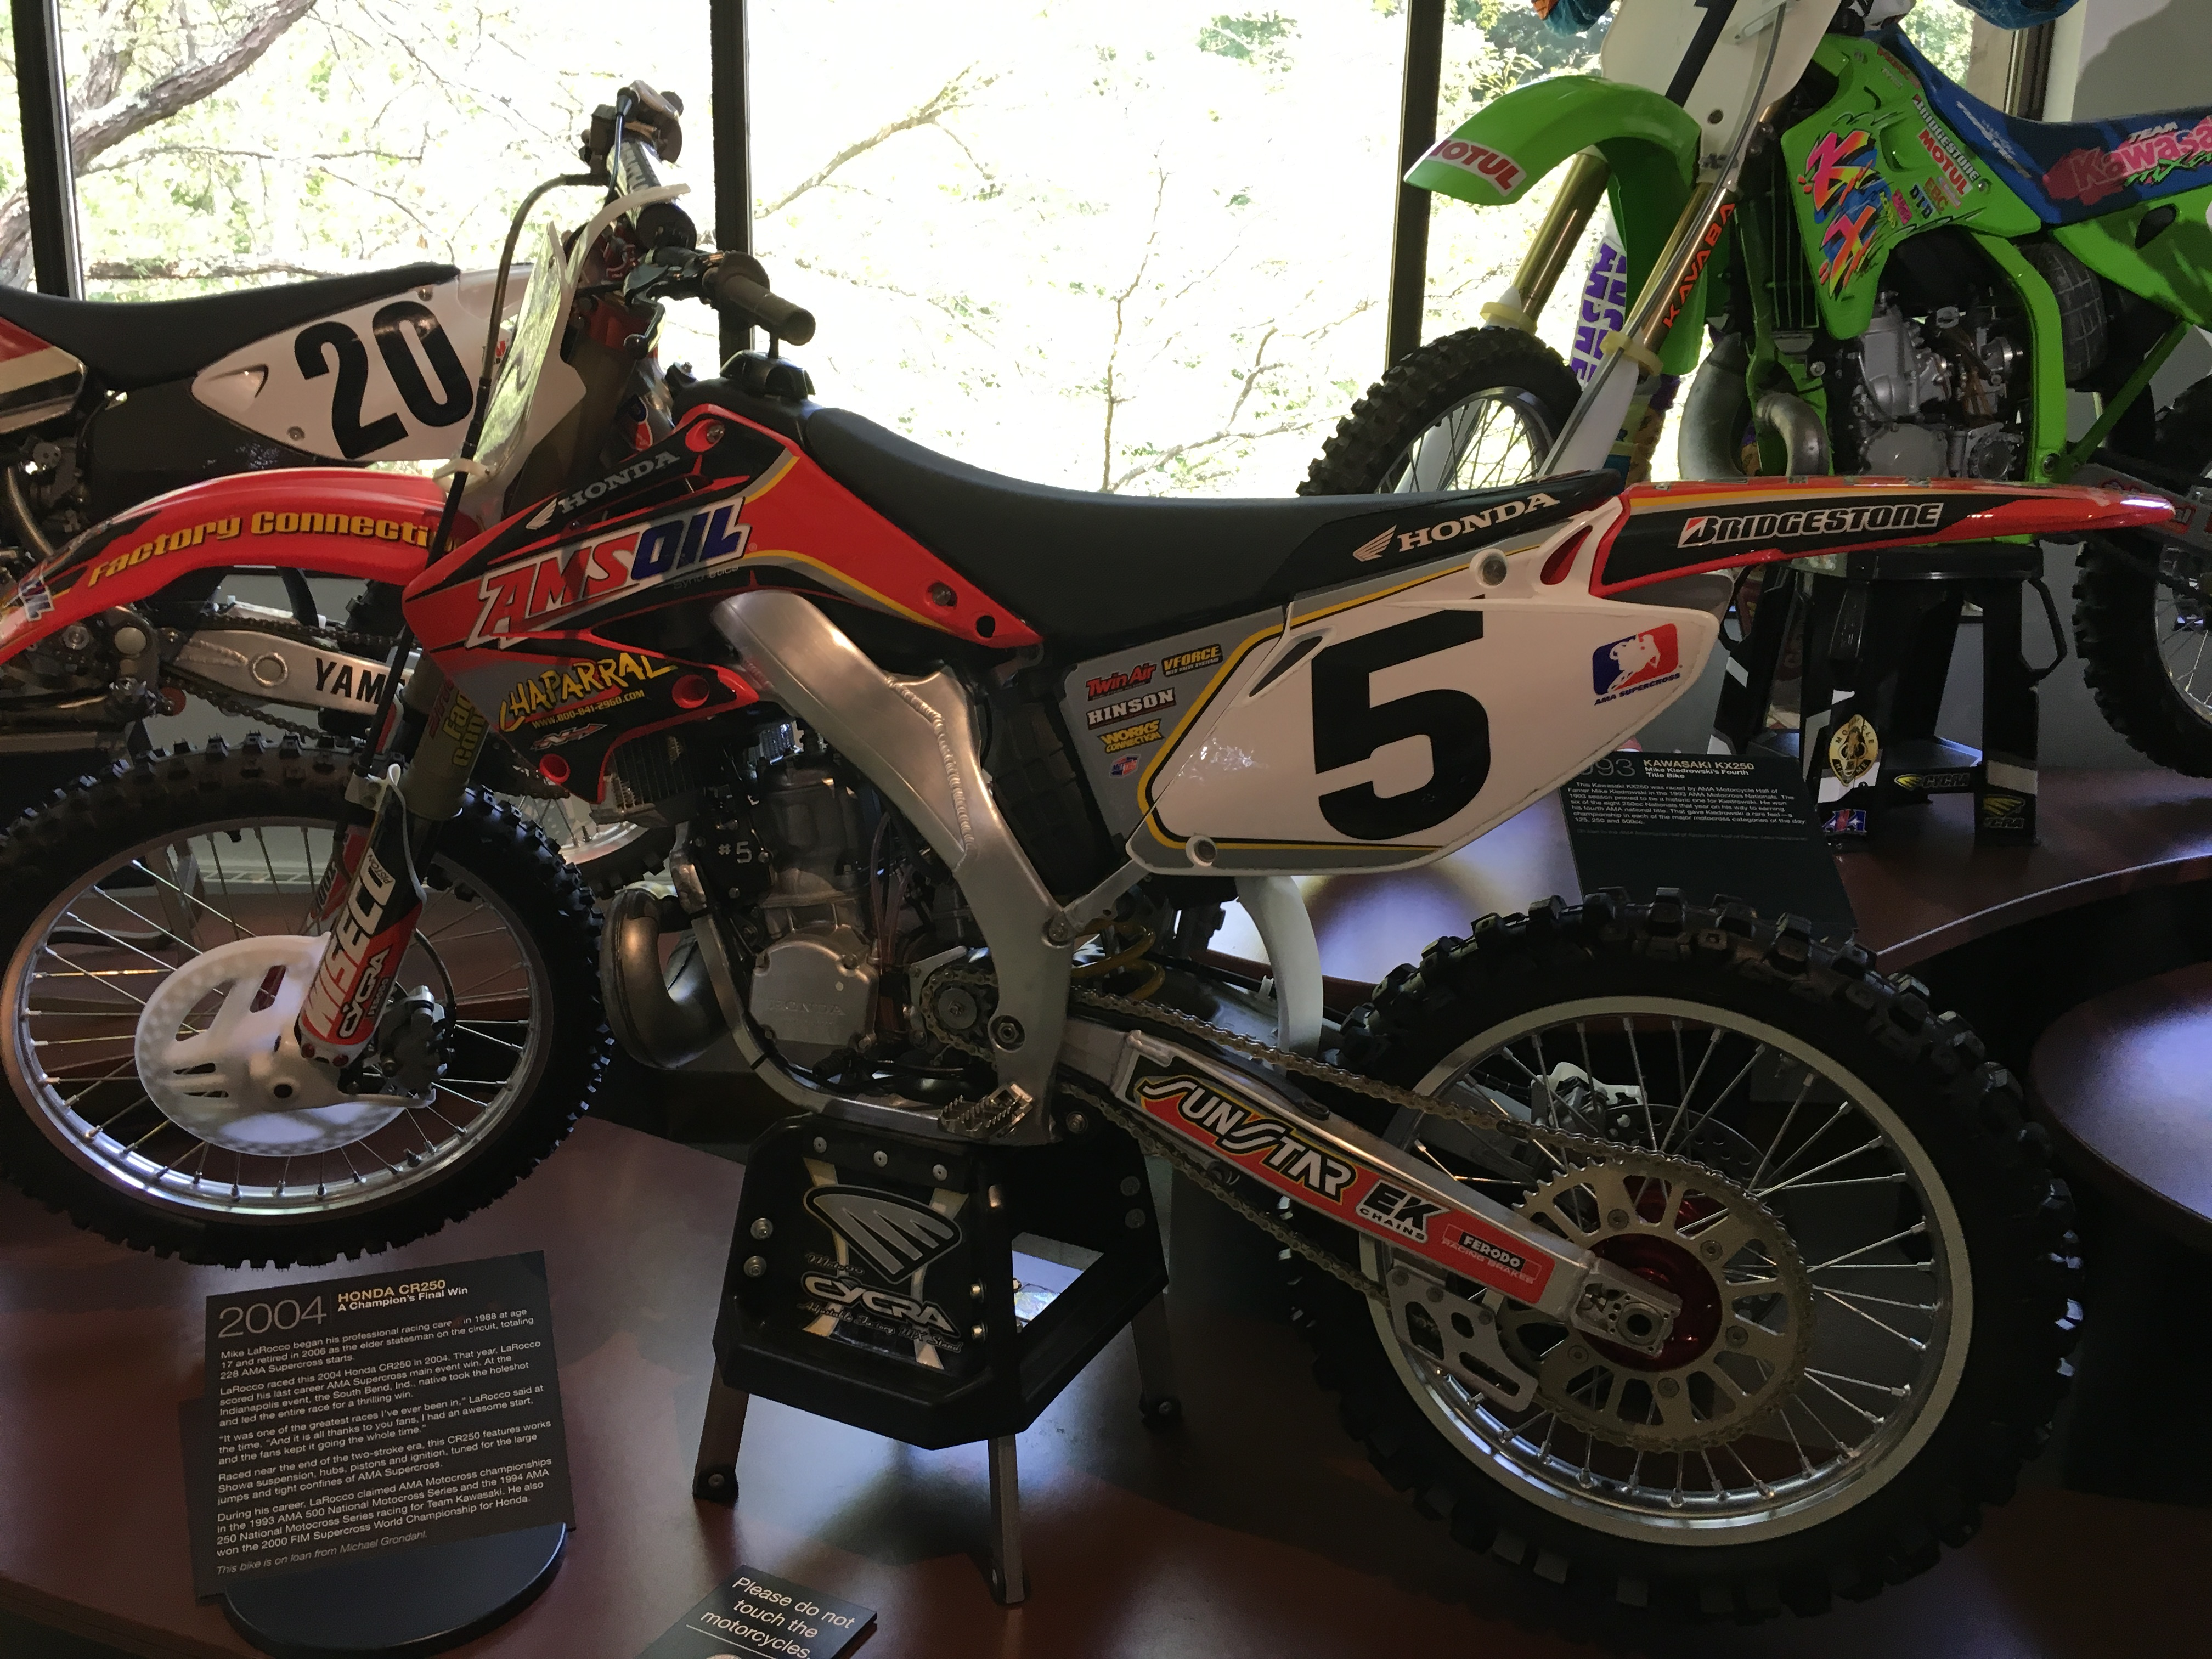 Mike LaRocco CR 250